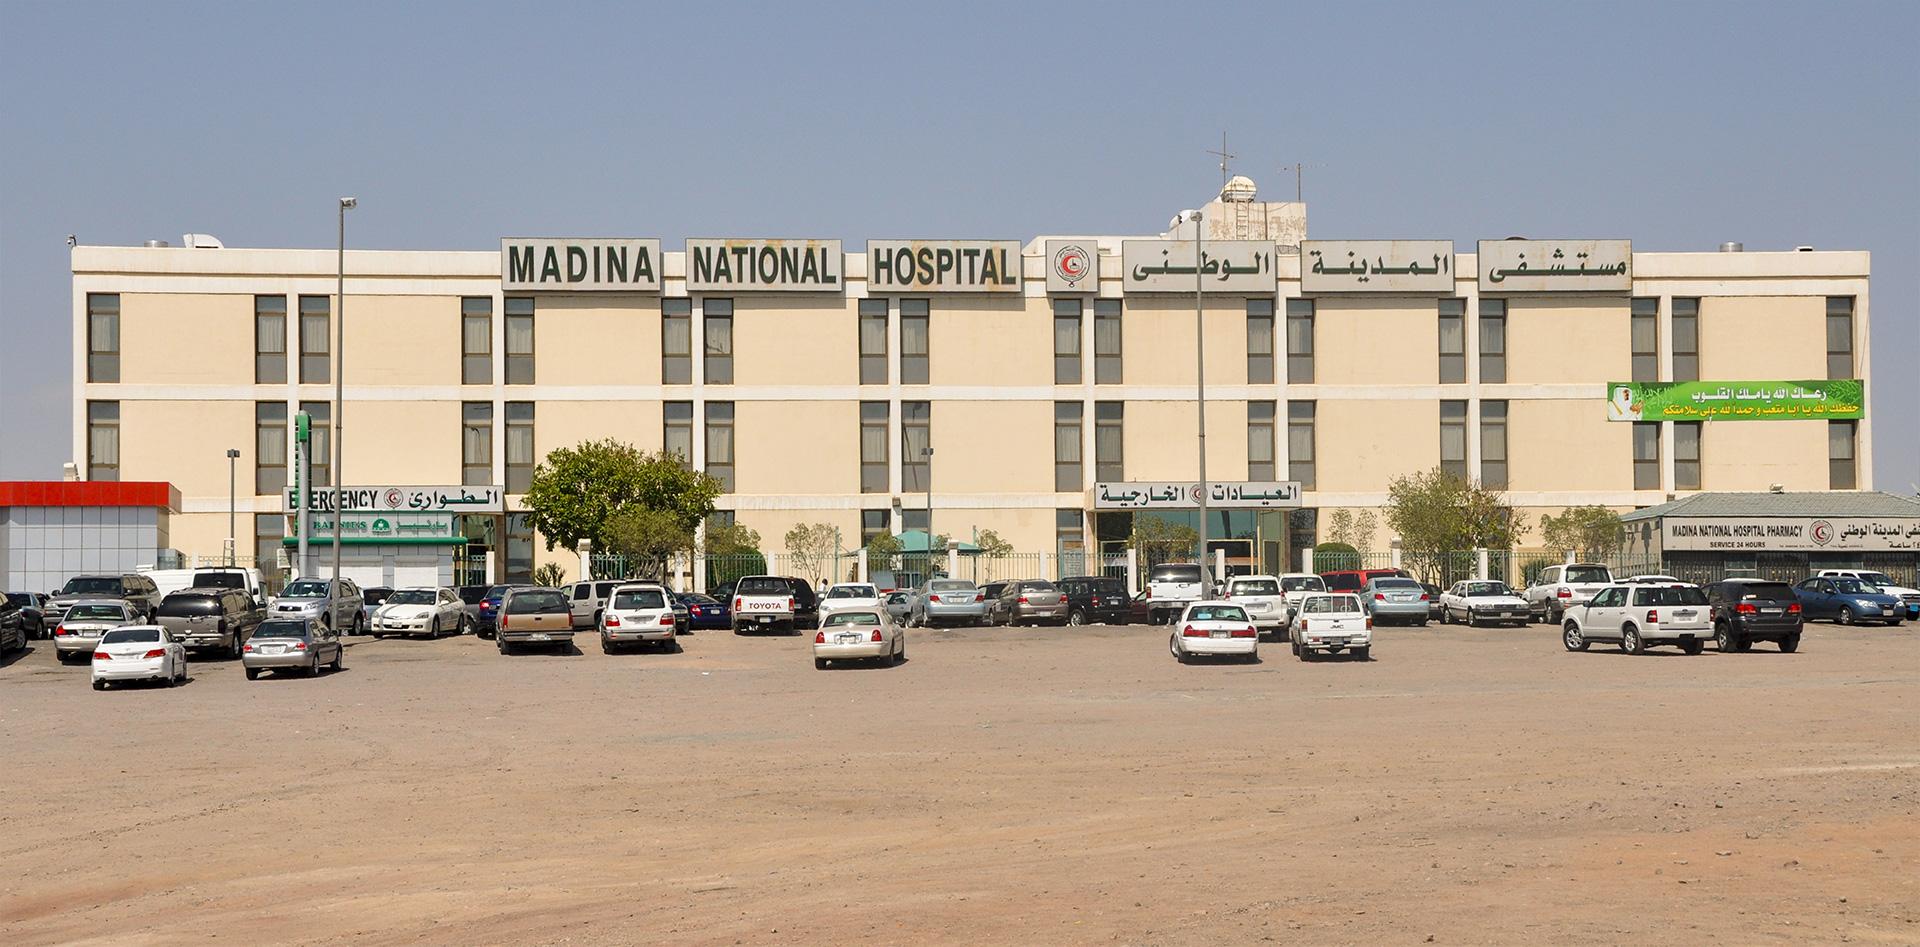 Madina National Hospital, Arabia Saudita, Binini Partners, Società di architettura e ingegneria